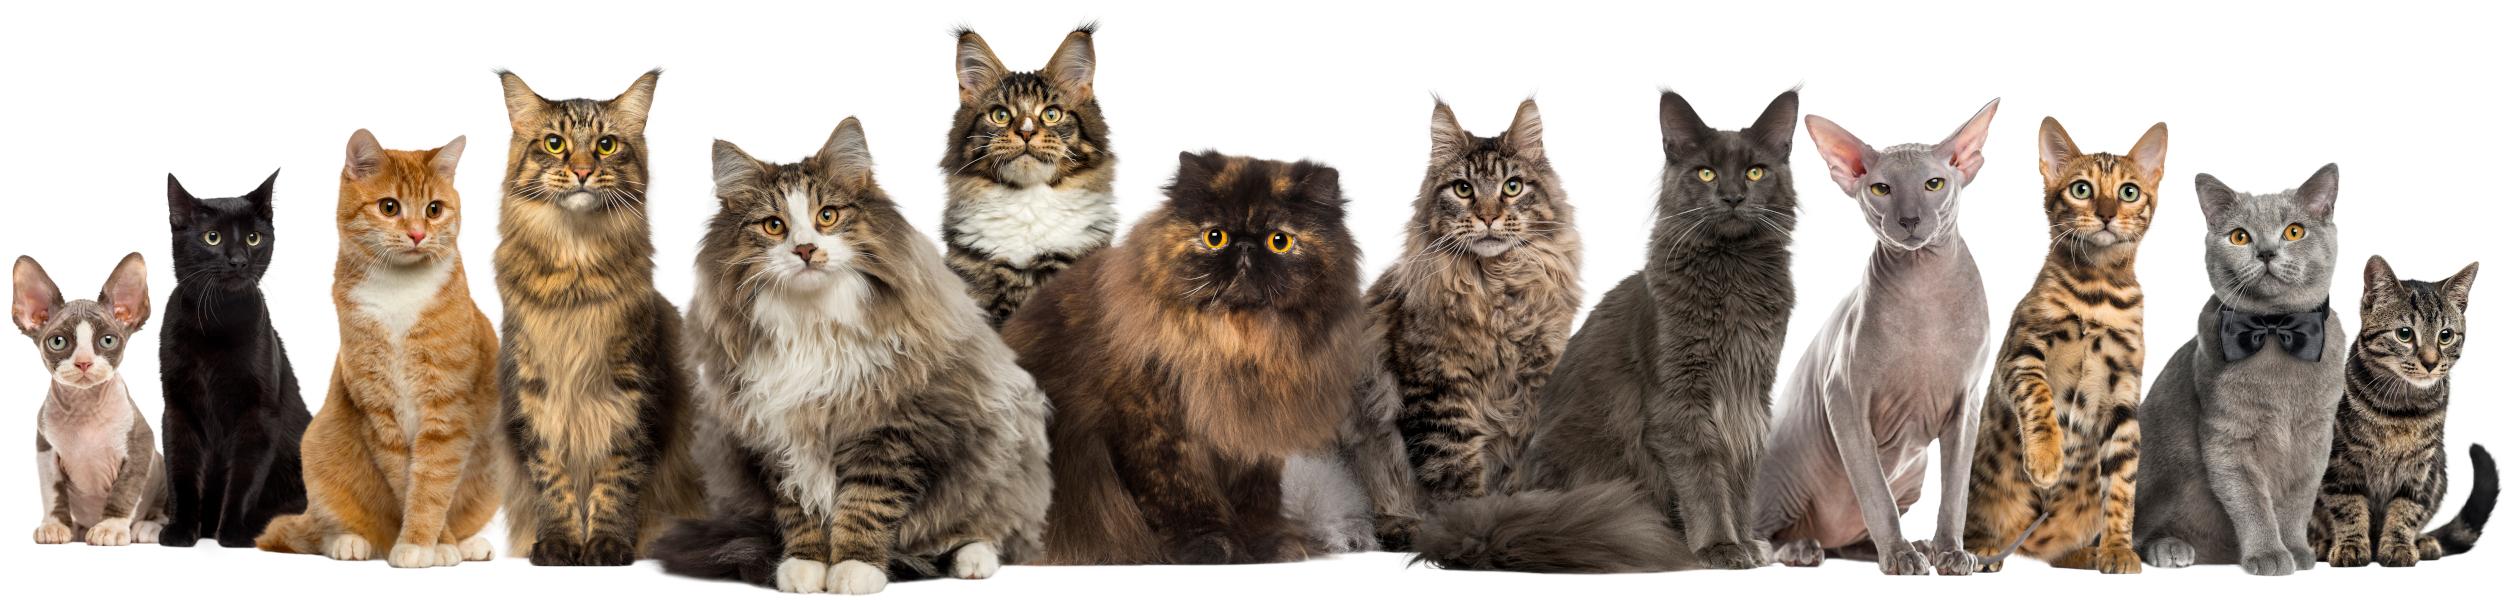 Cat Ancestry Veterinary Genetics Laboratory